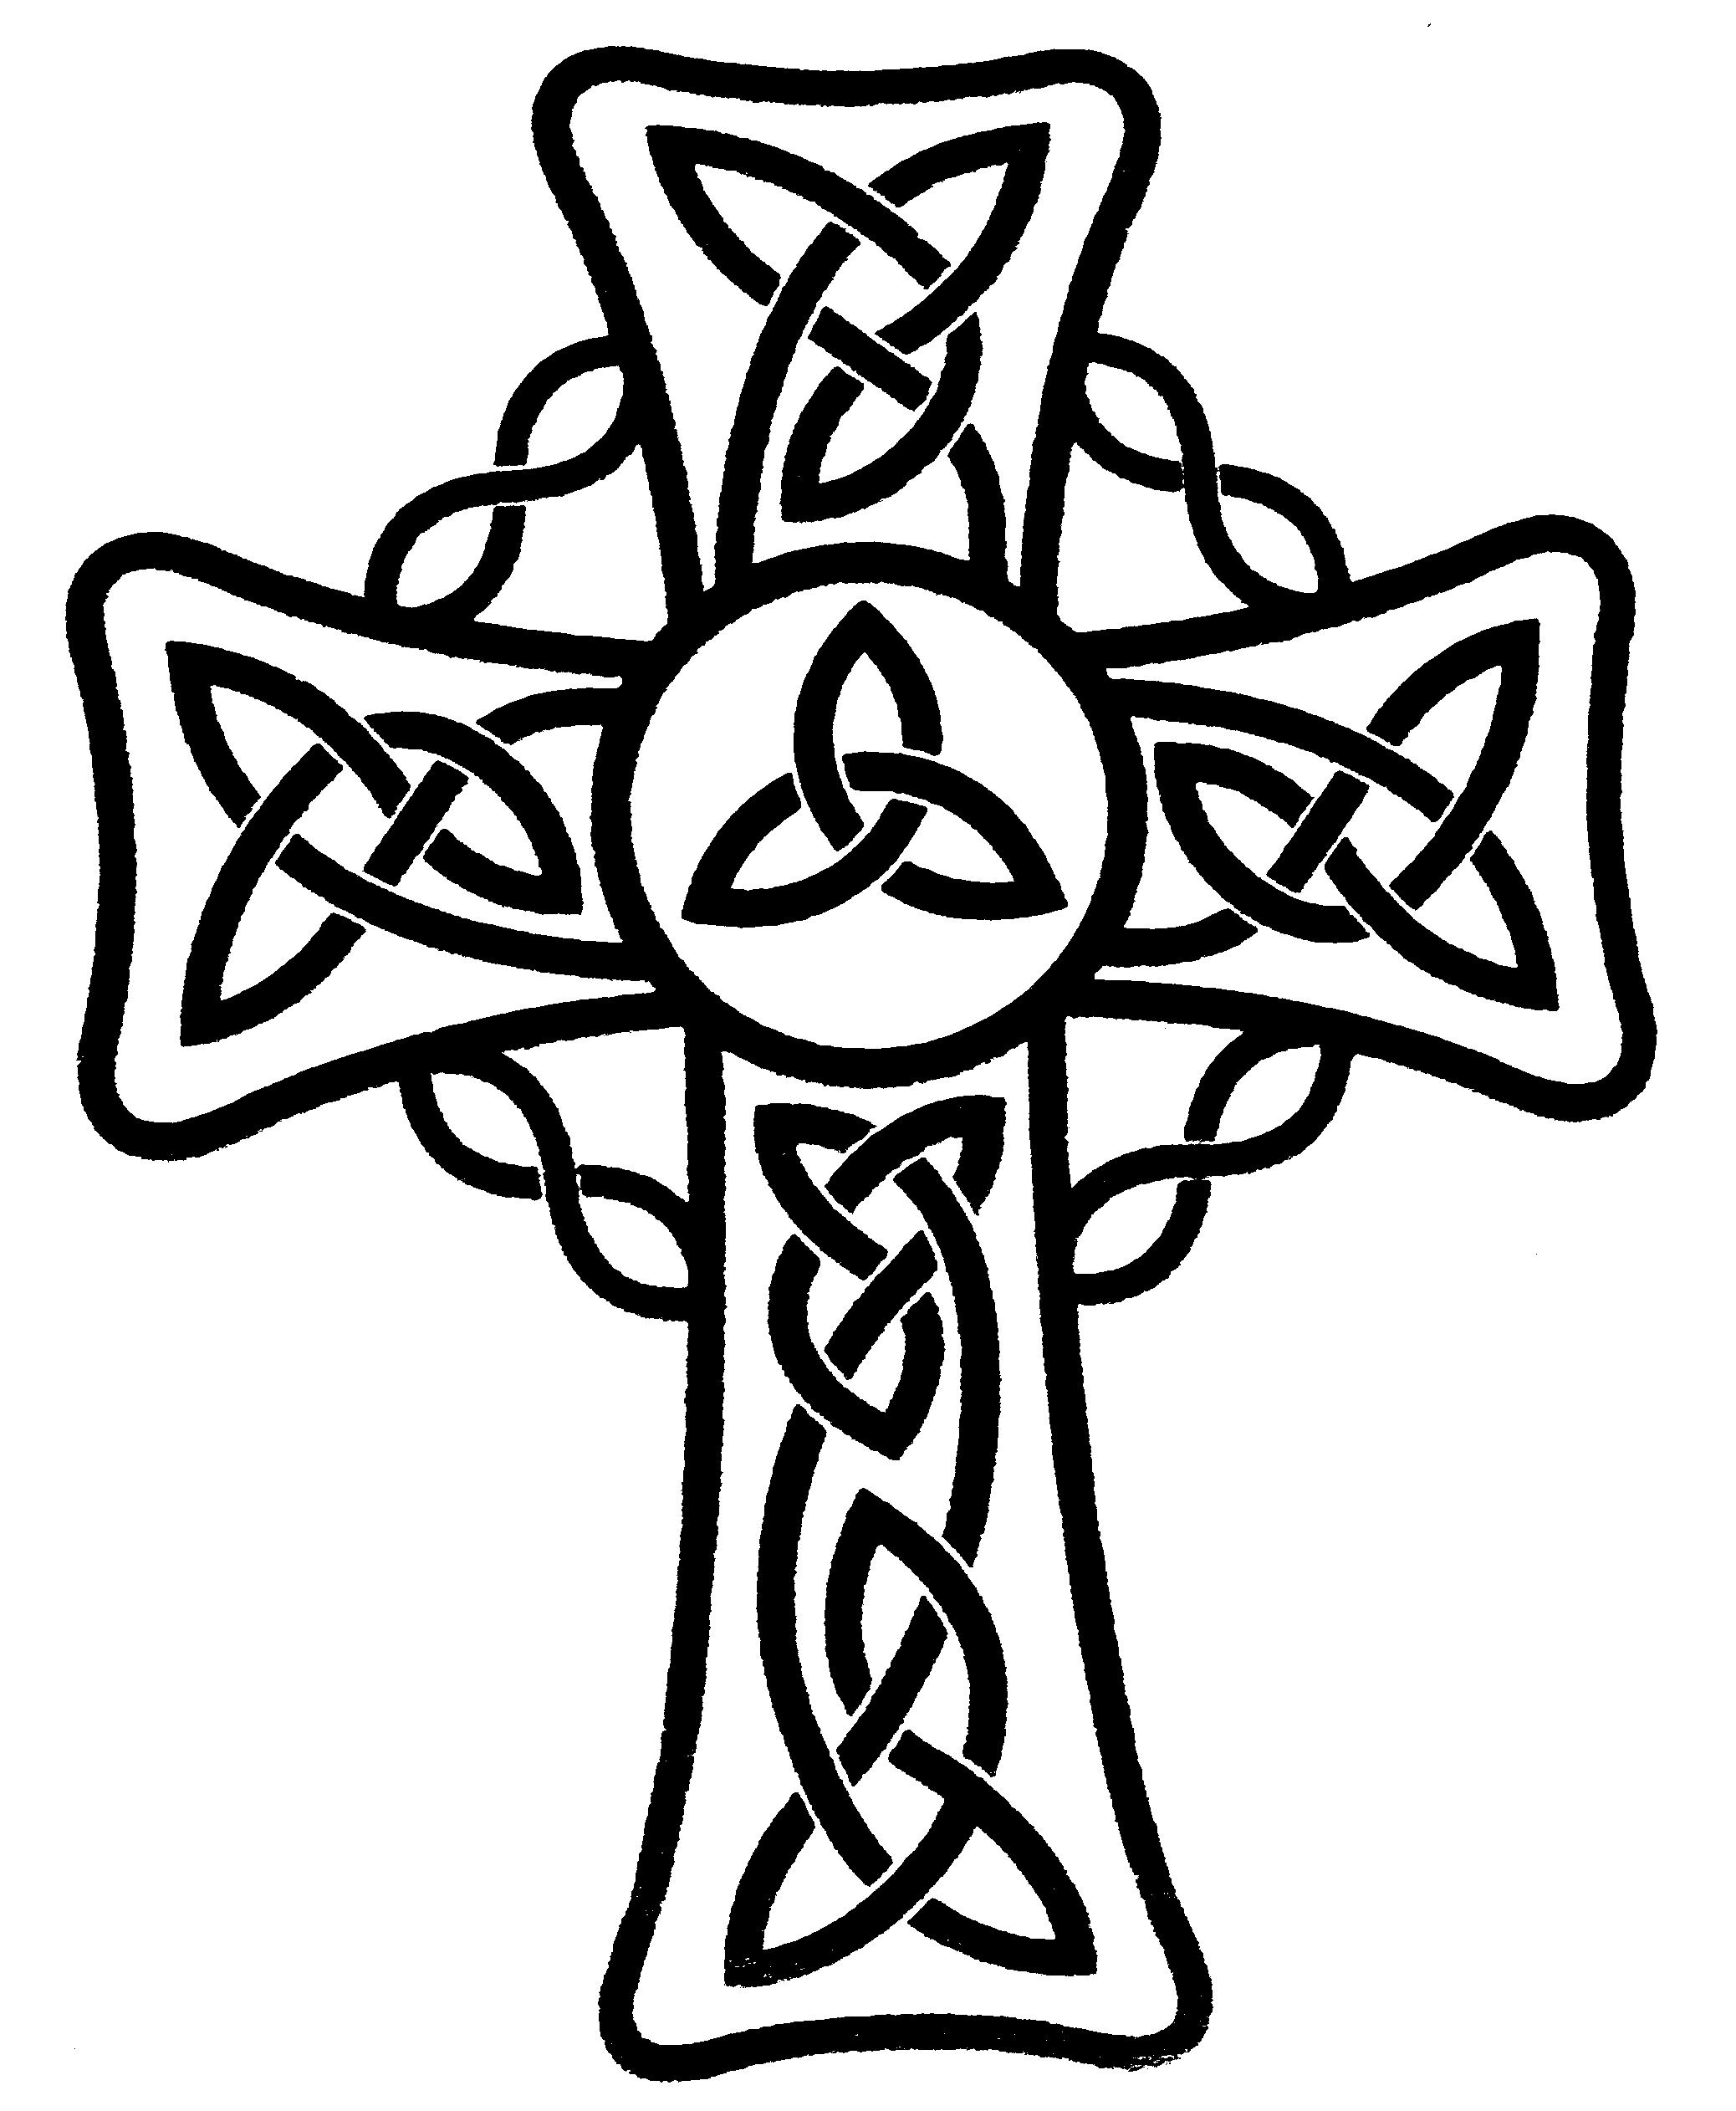 celtic designs 9 symbolic courageous tribal celtic tattoo designs designs celtic